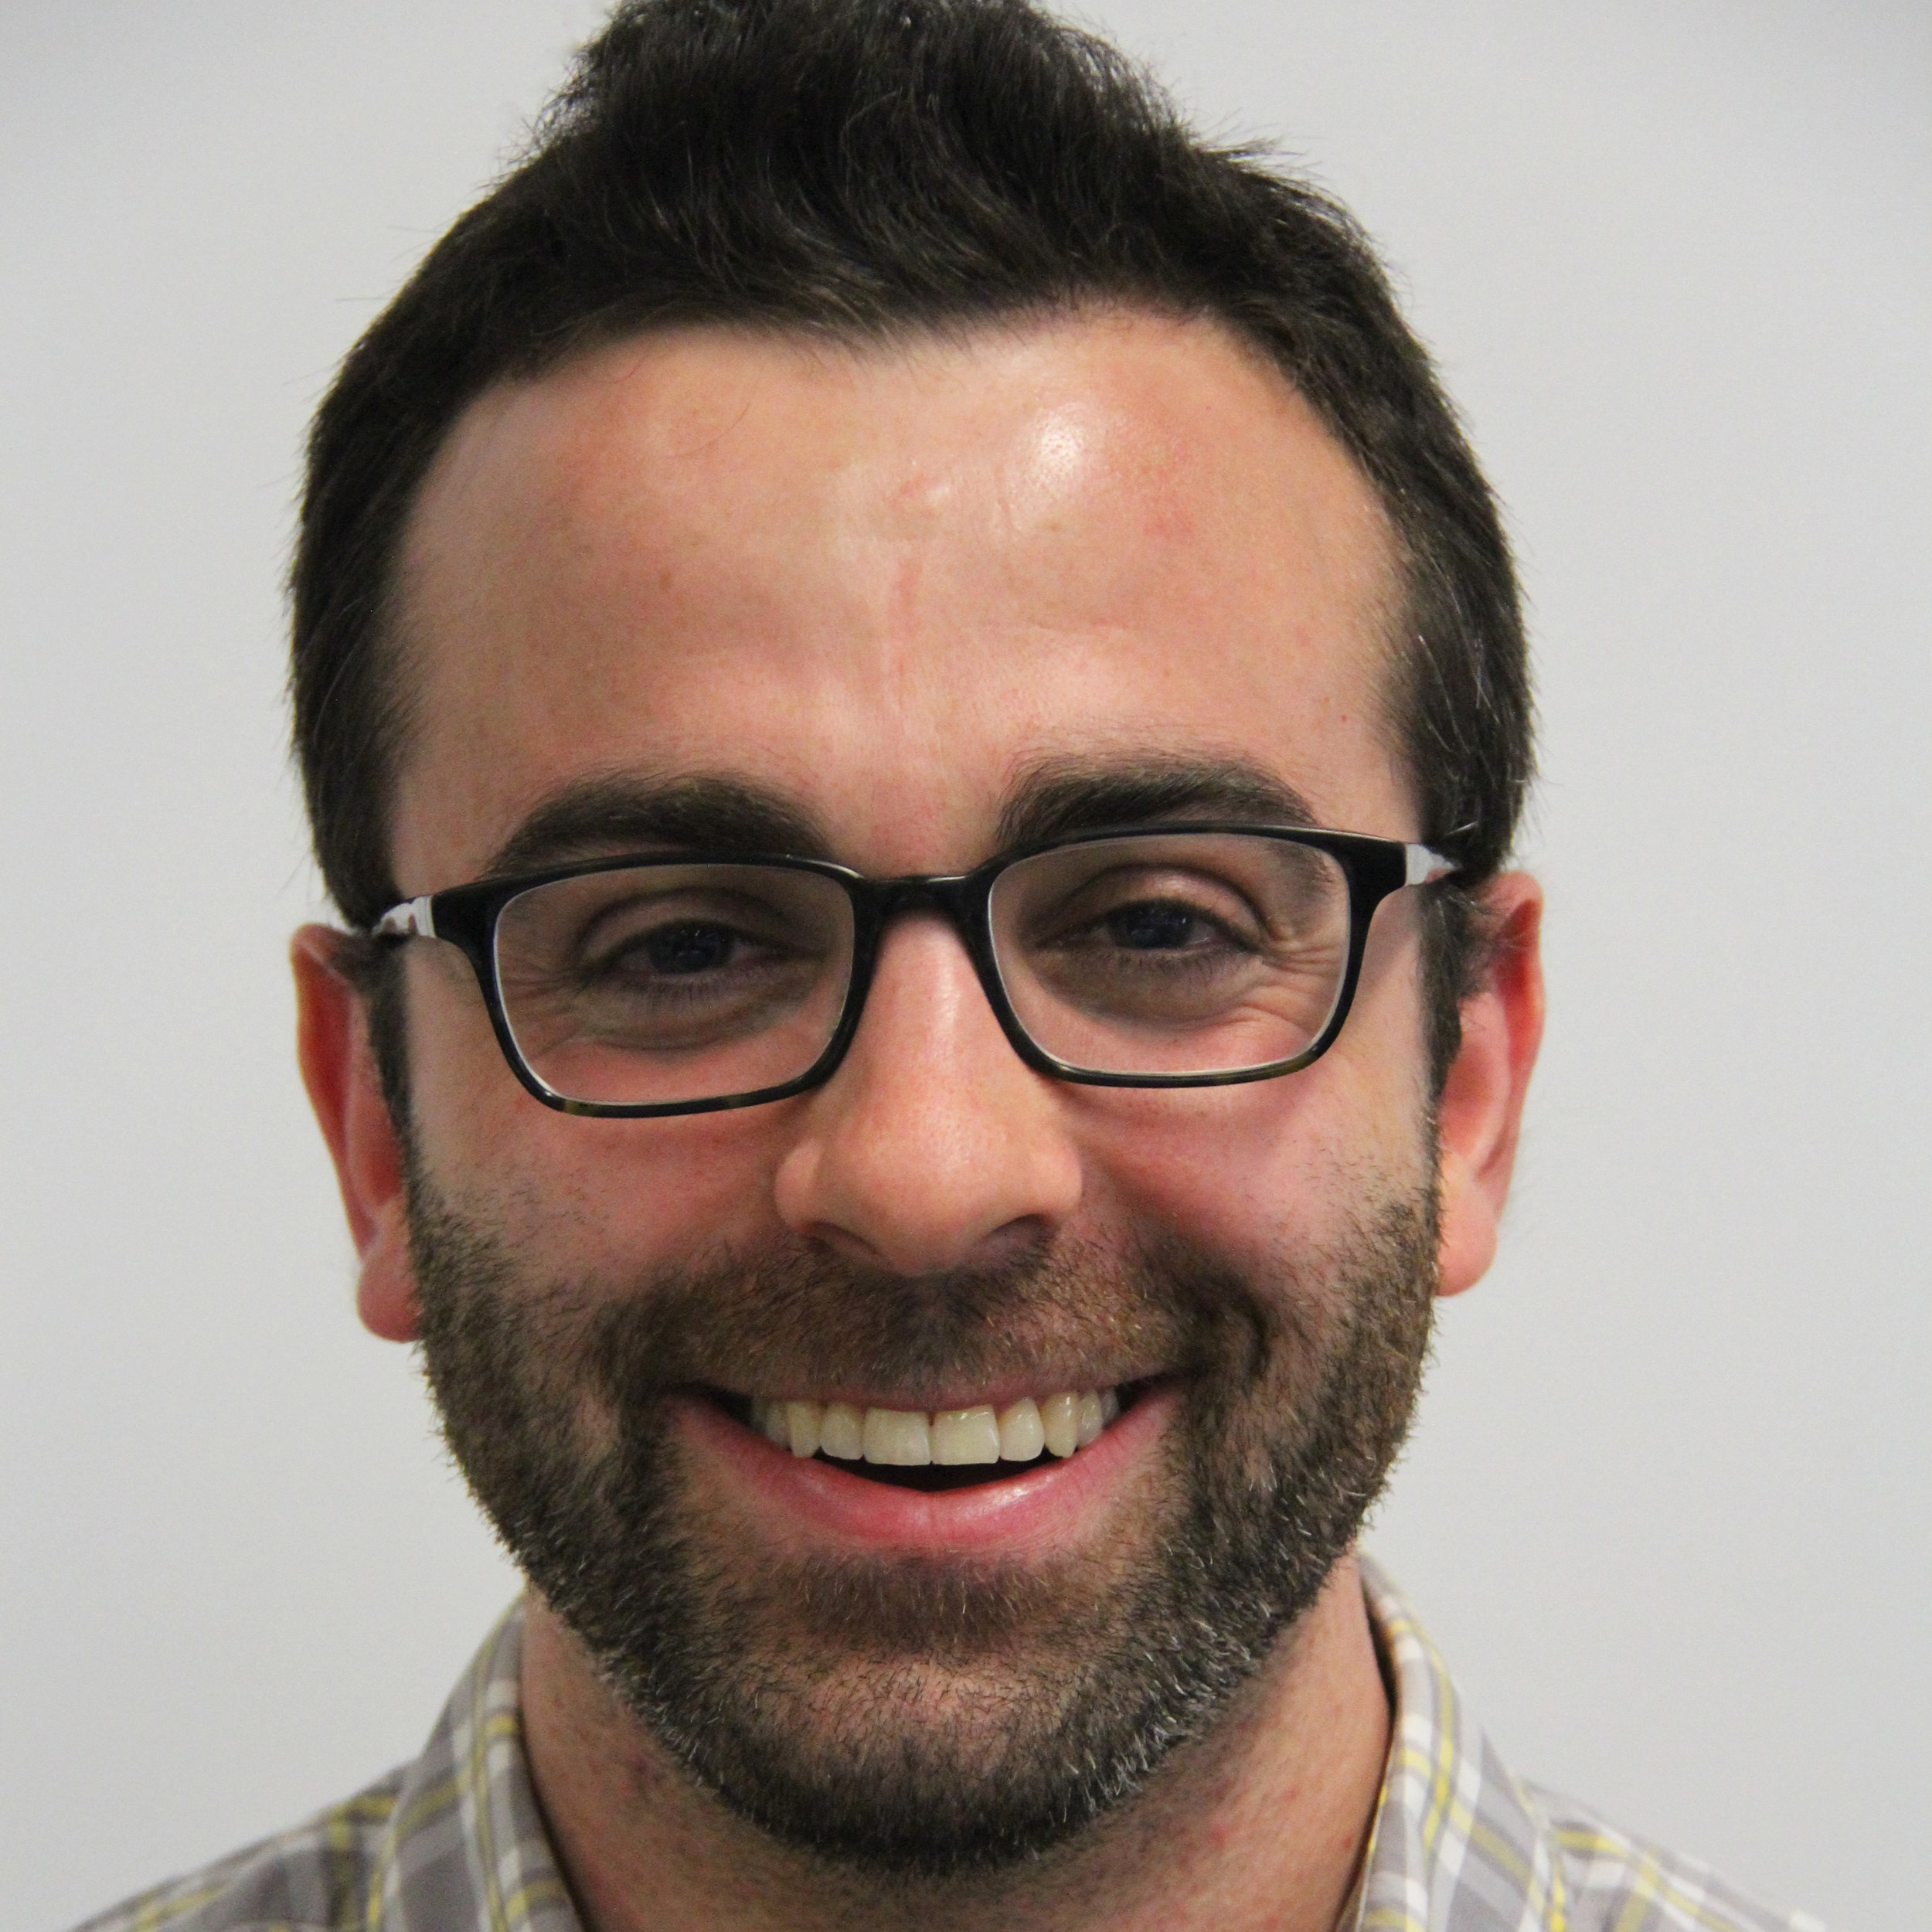 David Engel, NYC Lead